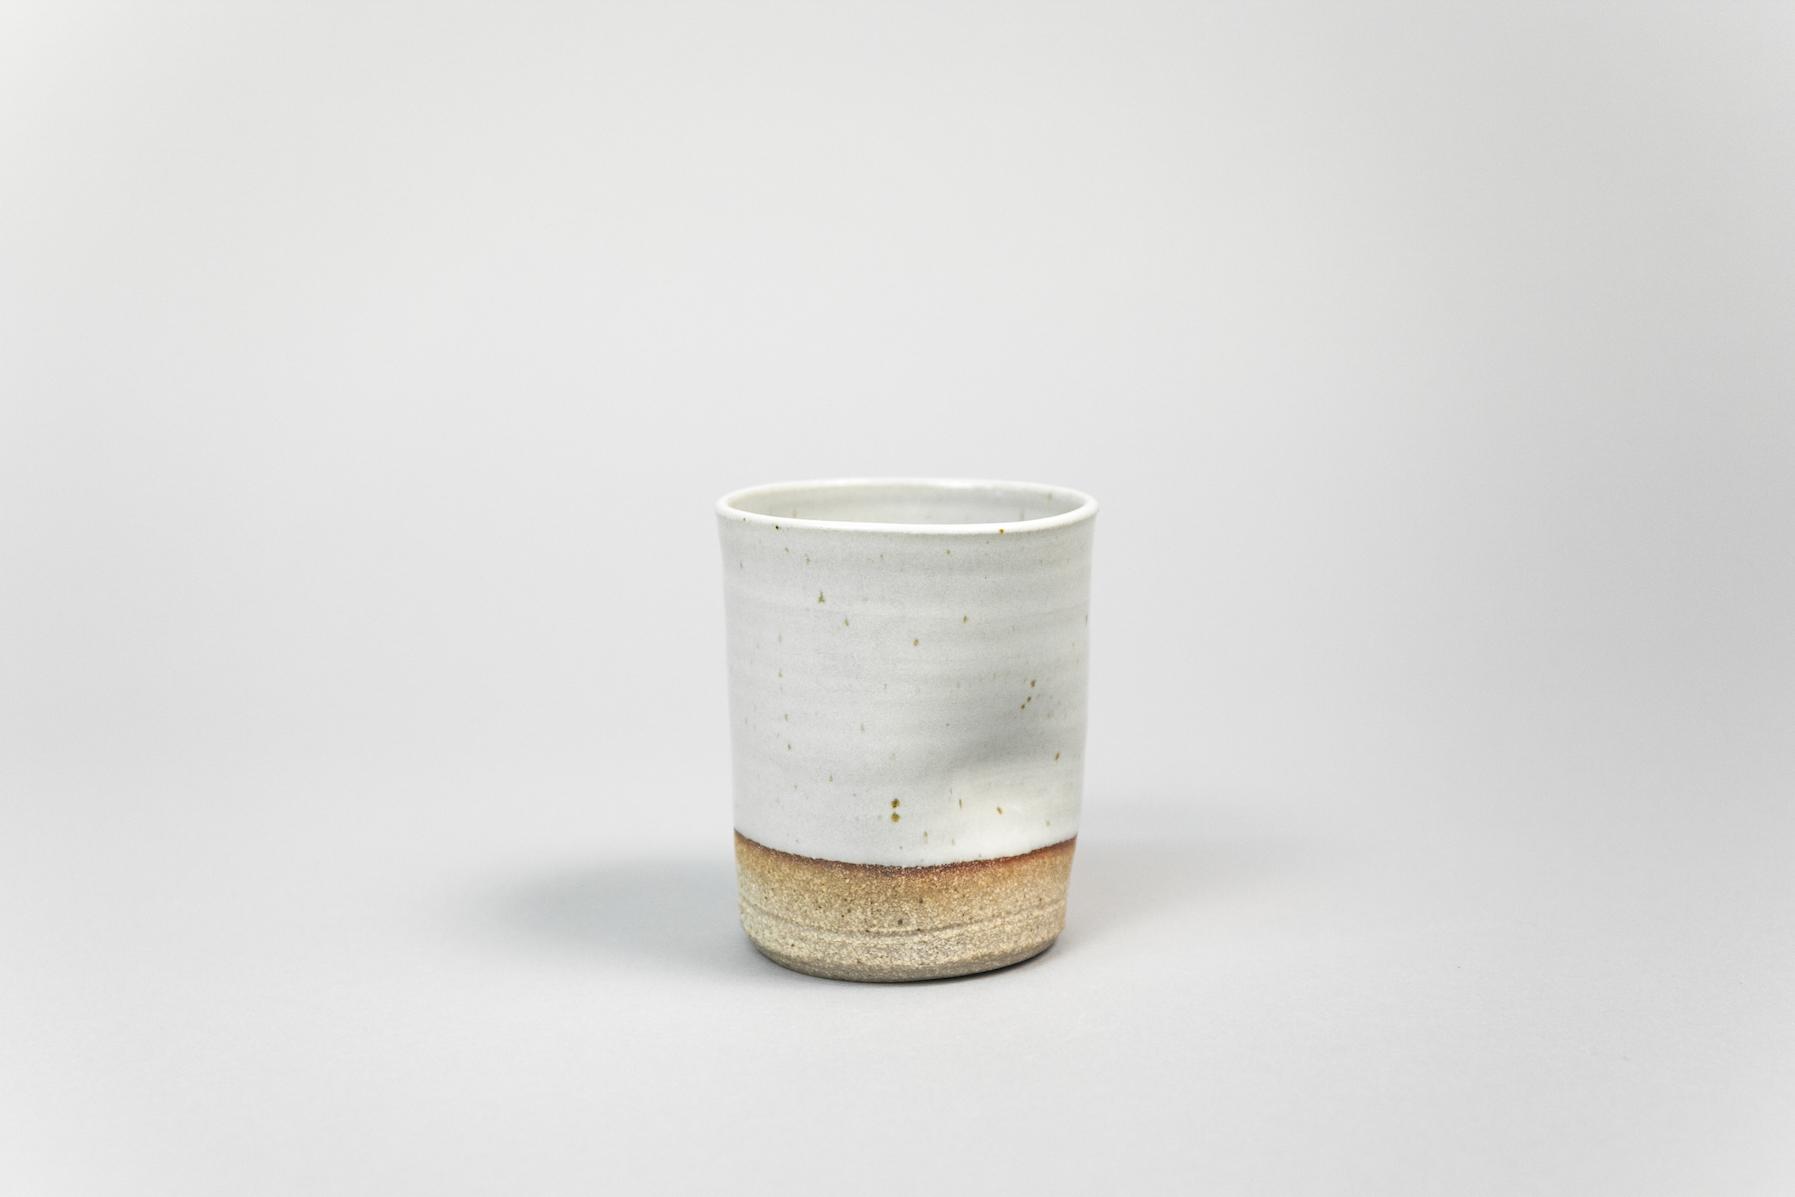 THUMB CUP